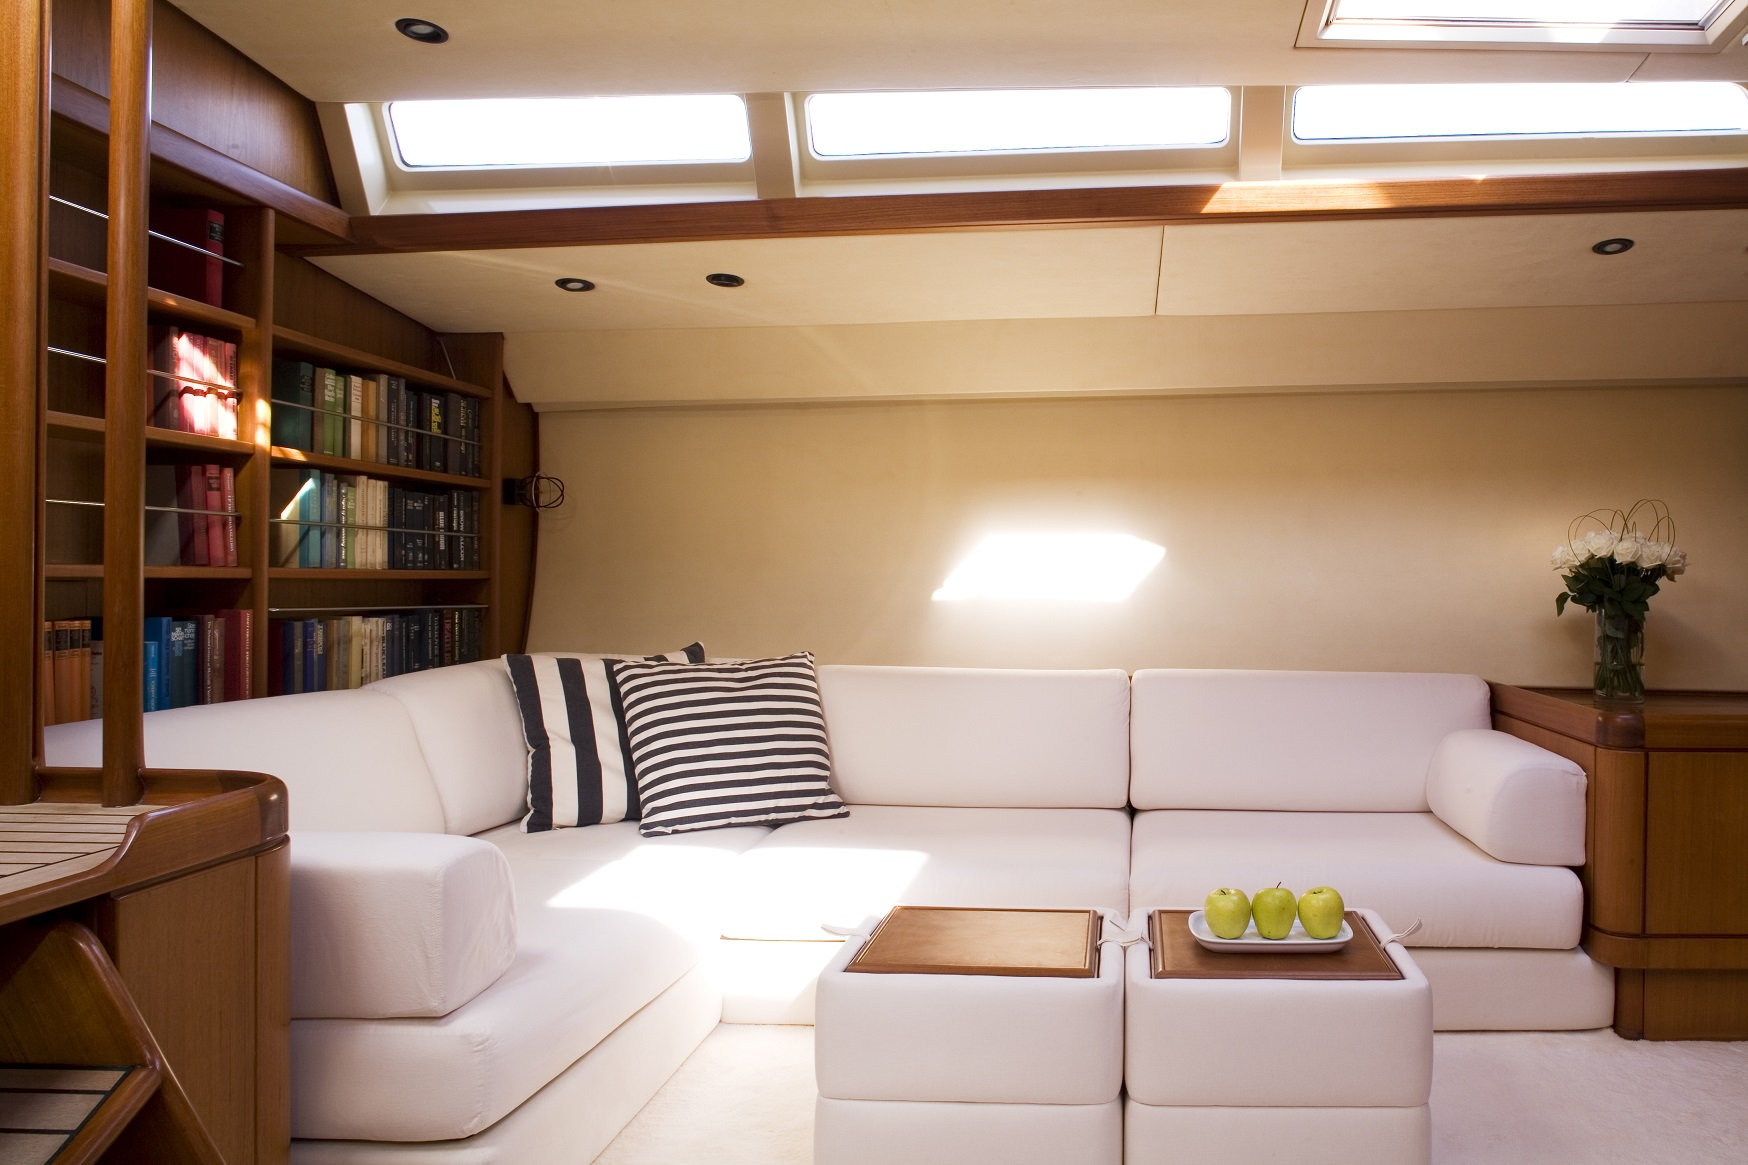 S/Y CYCLOS II yacht charter livingroom area